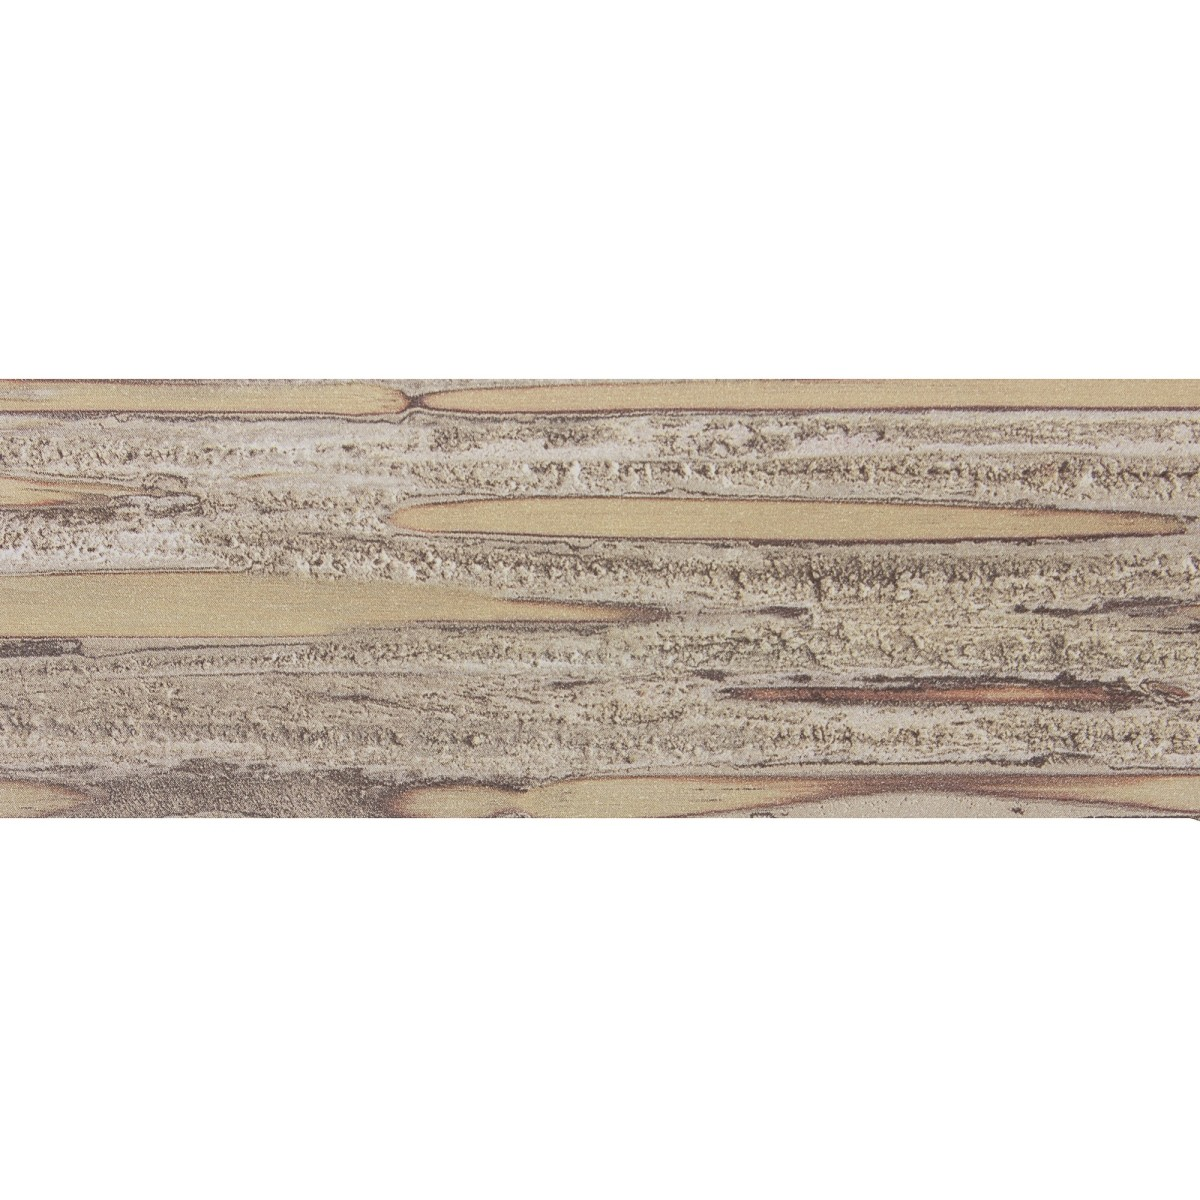 Кромочный Пластик Для Столешницы С Клеем 2042М Бамбук 45Х305